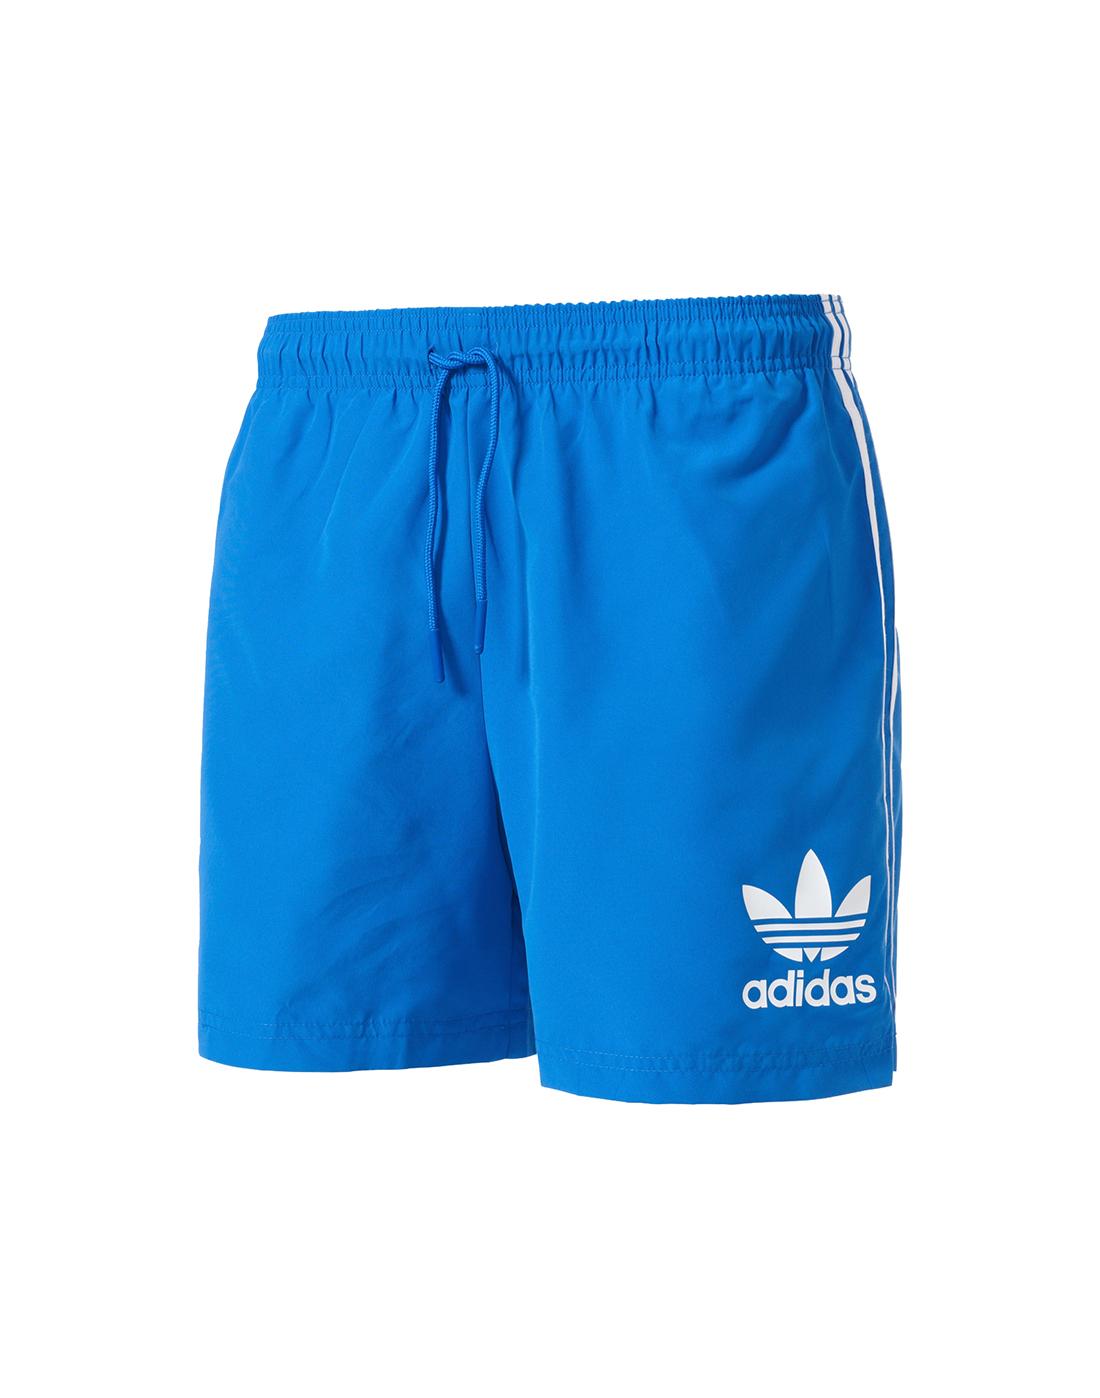 ded378a233 adidas Originals. Mens California Short. Mens California Short ...